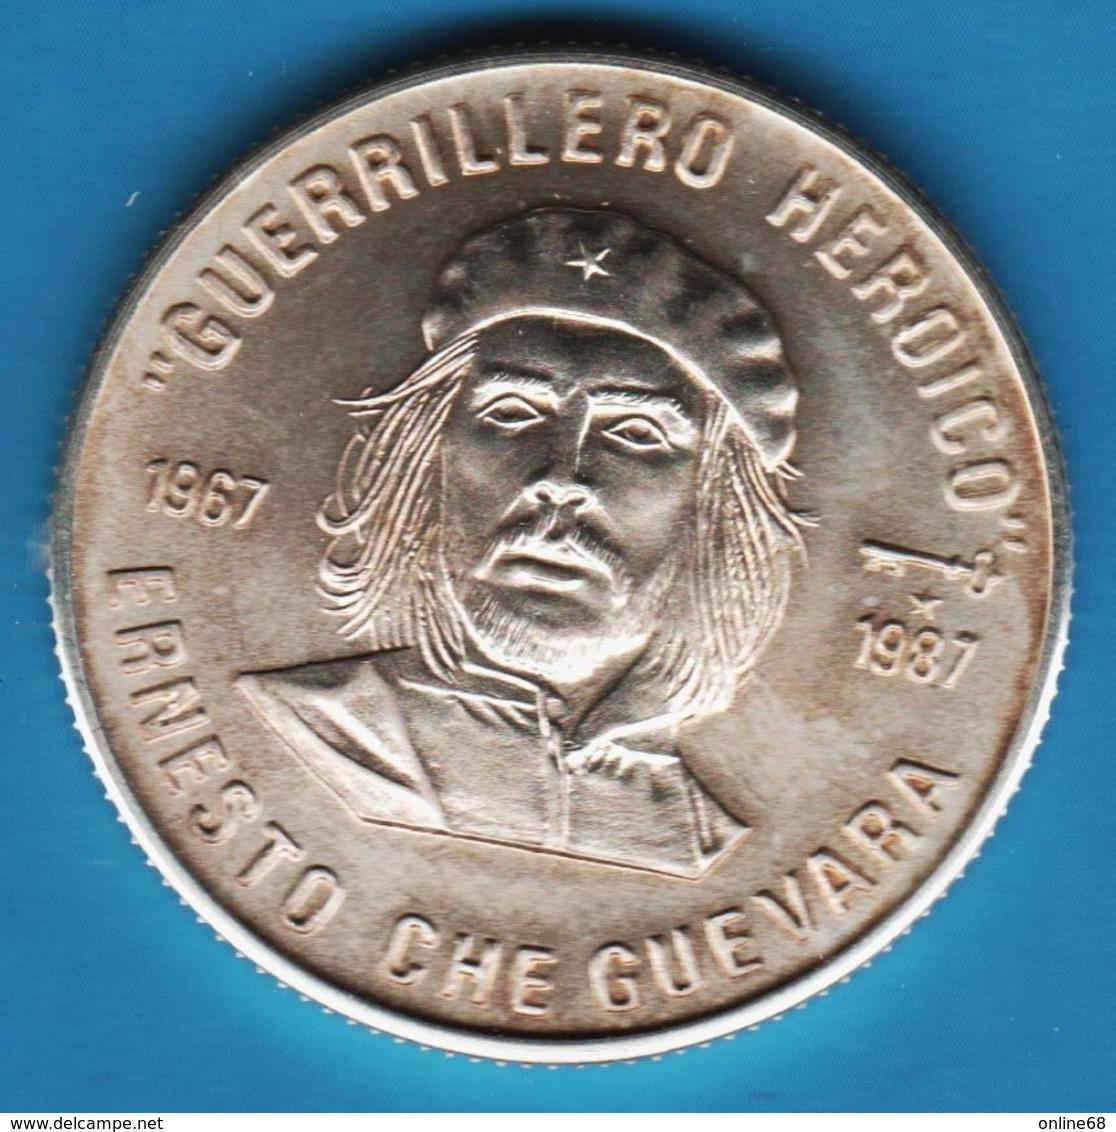 CUBA 5 Pesos 1987 ERNESTO CHE GUEVARA SILVER _ ARGENT 999‰  SCARCE !!! - Cuba